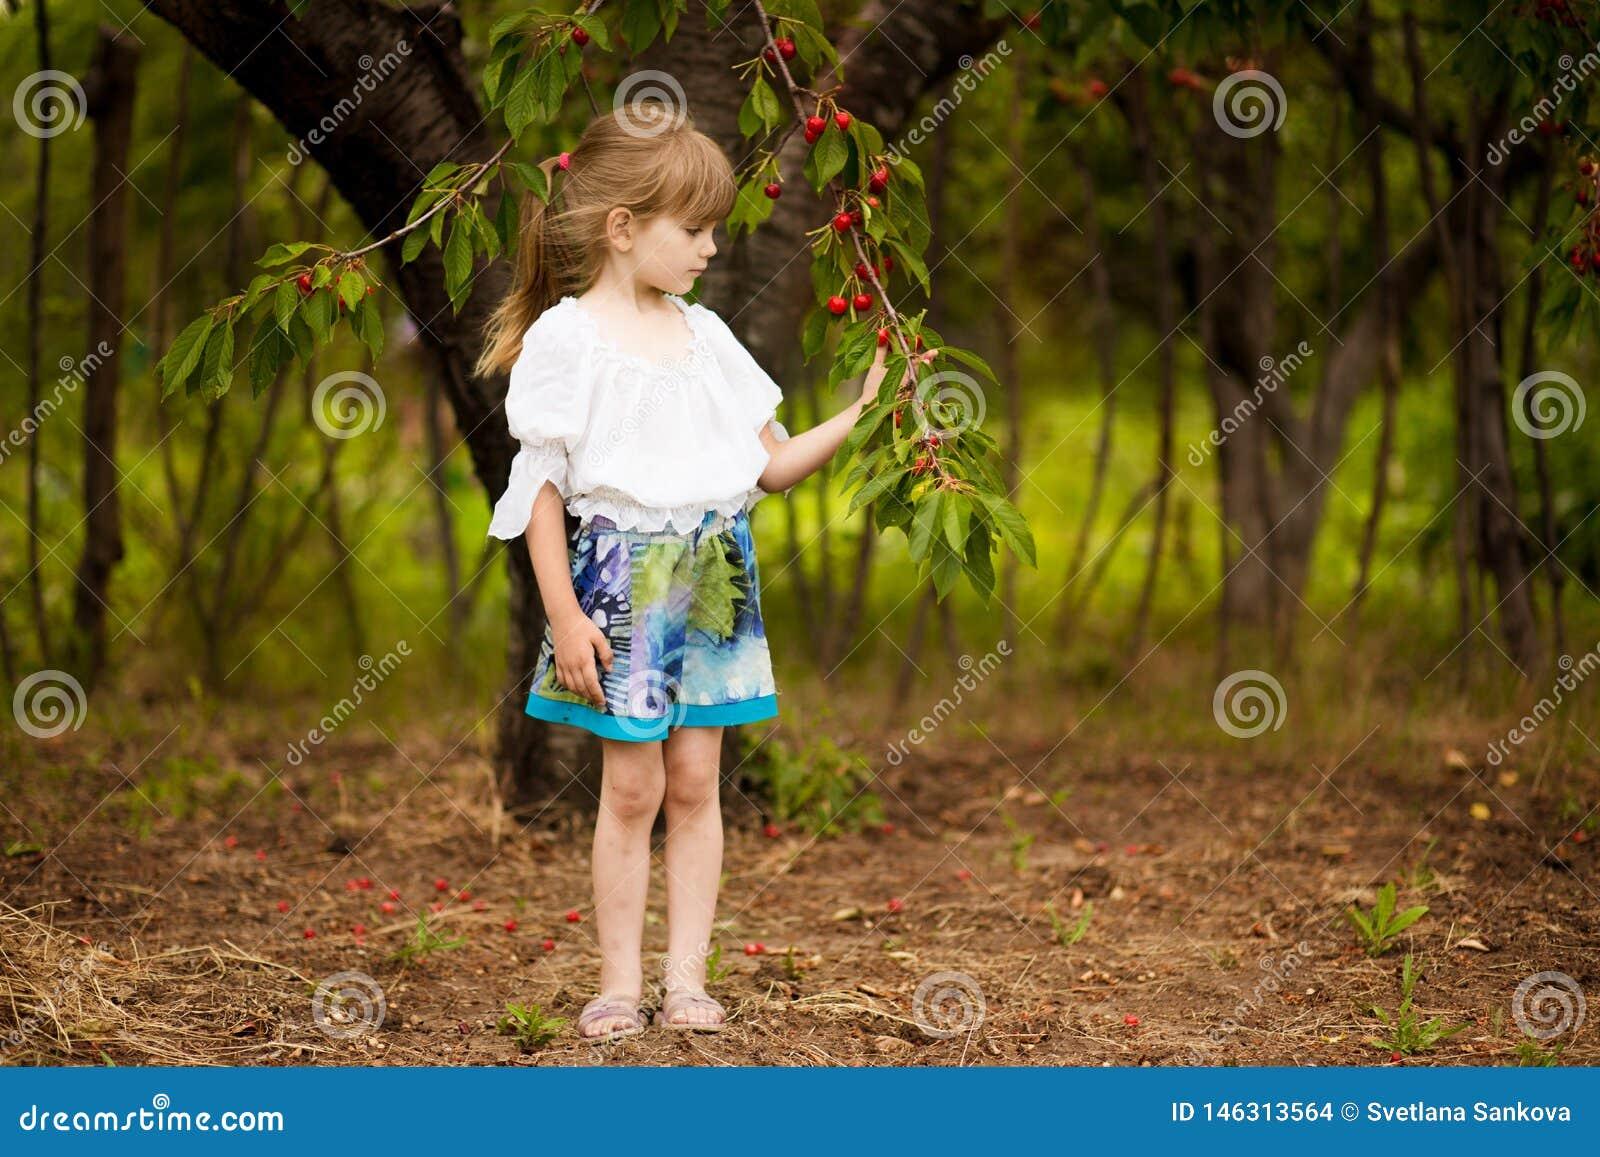 Happy little girl play near cherry tree in summer garden. Kid picking cherry on fruit farm. Child pick cherries in orchard.